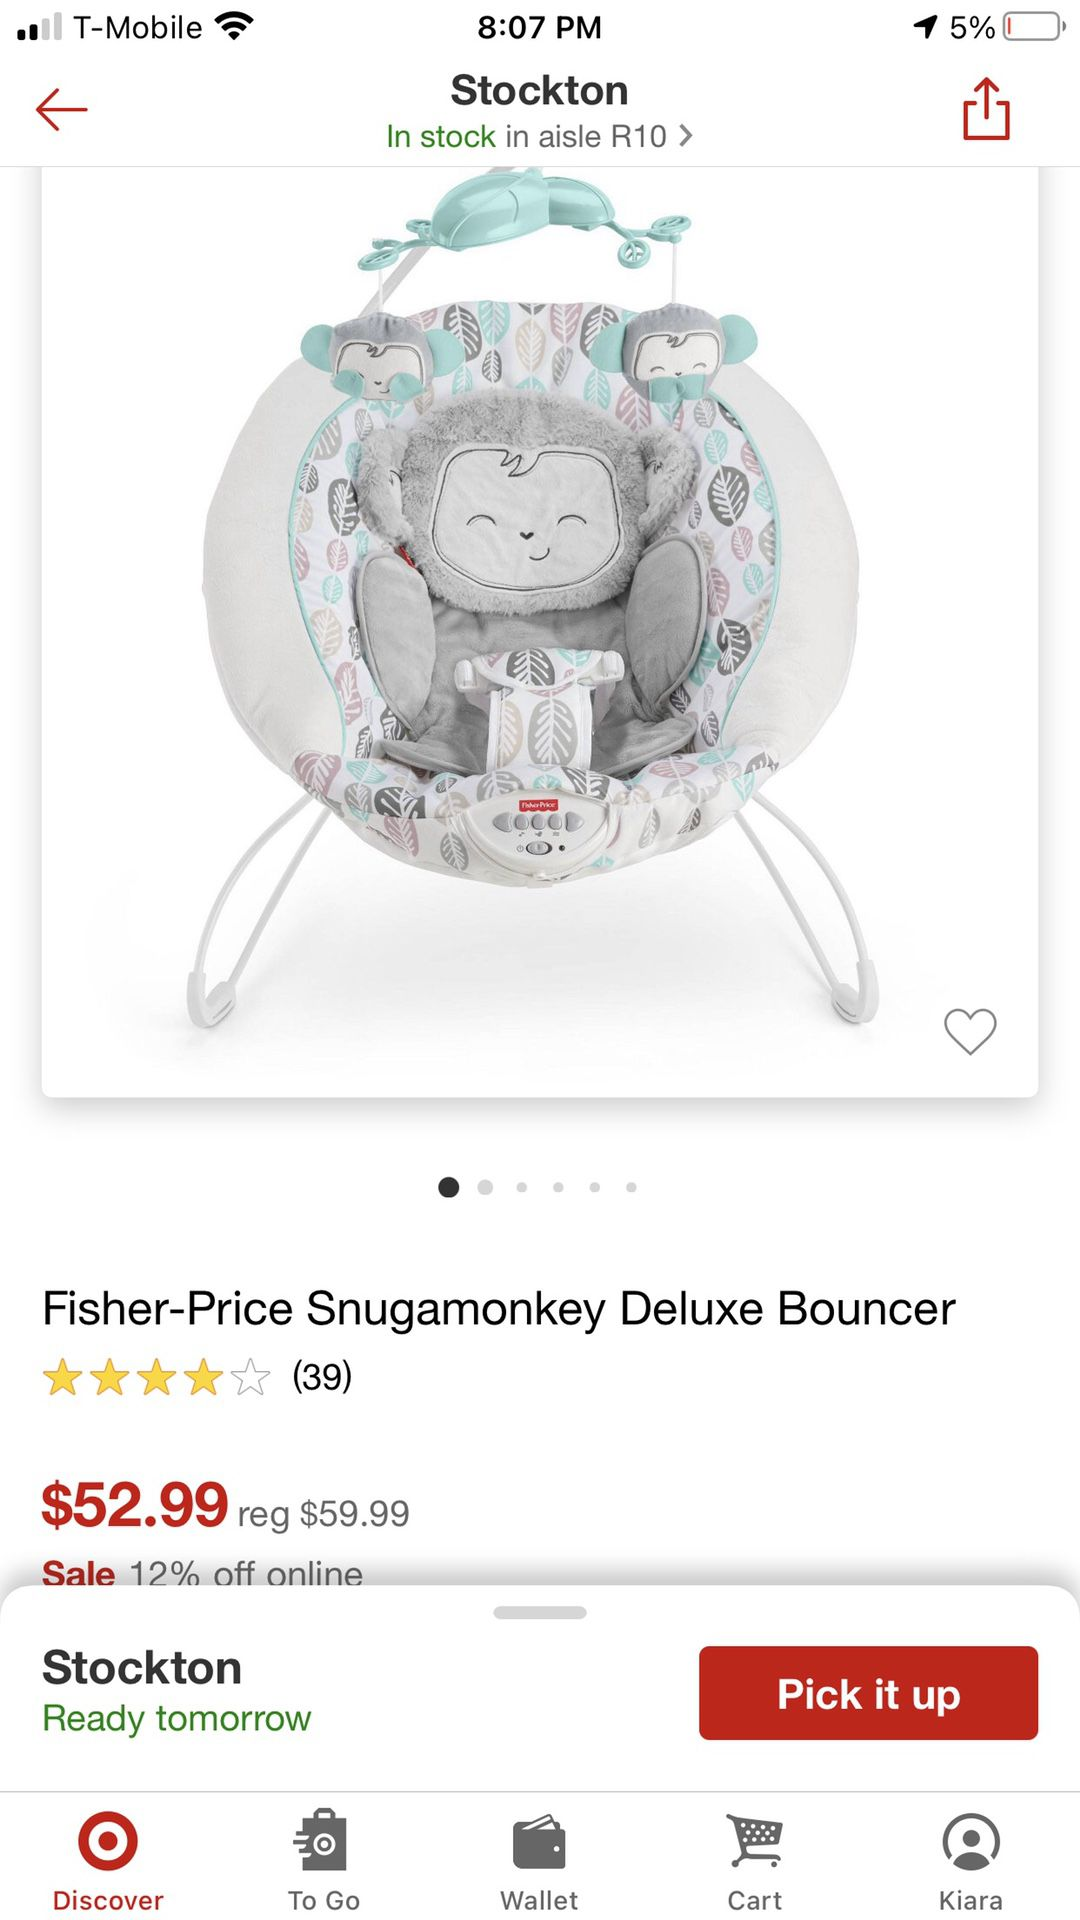 Fisher Price Snugamonkey Deluxe Bouncer